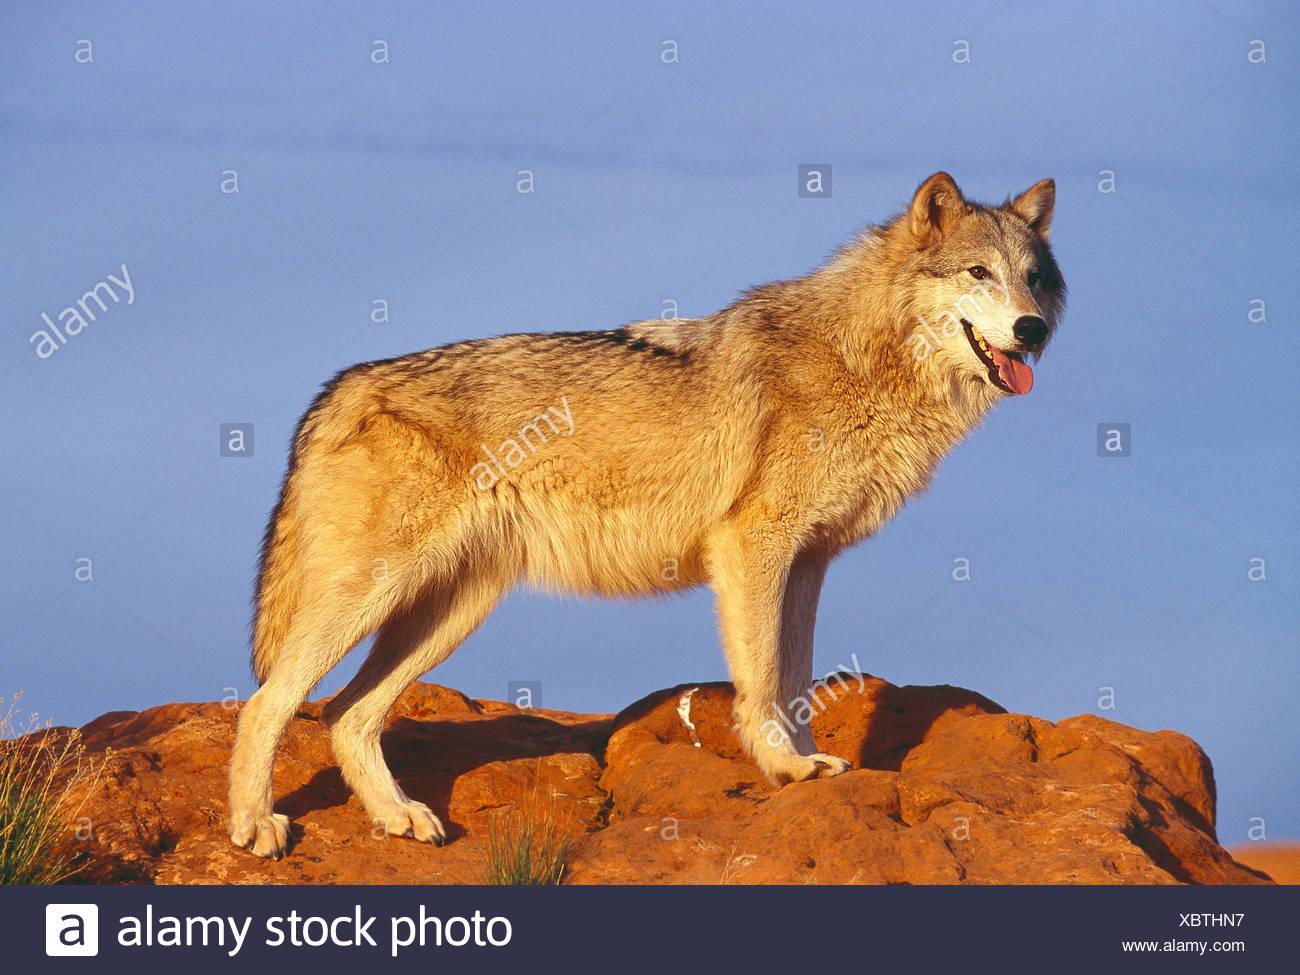 USA. Wildlife. Gray Wolf. Stock Photo